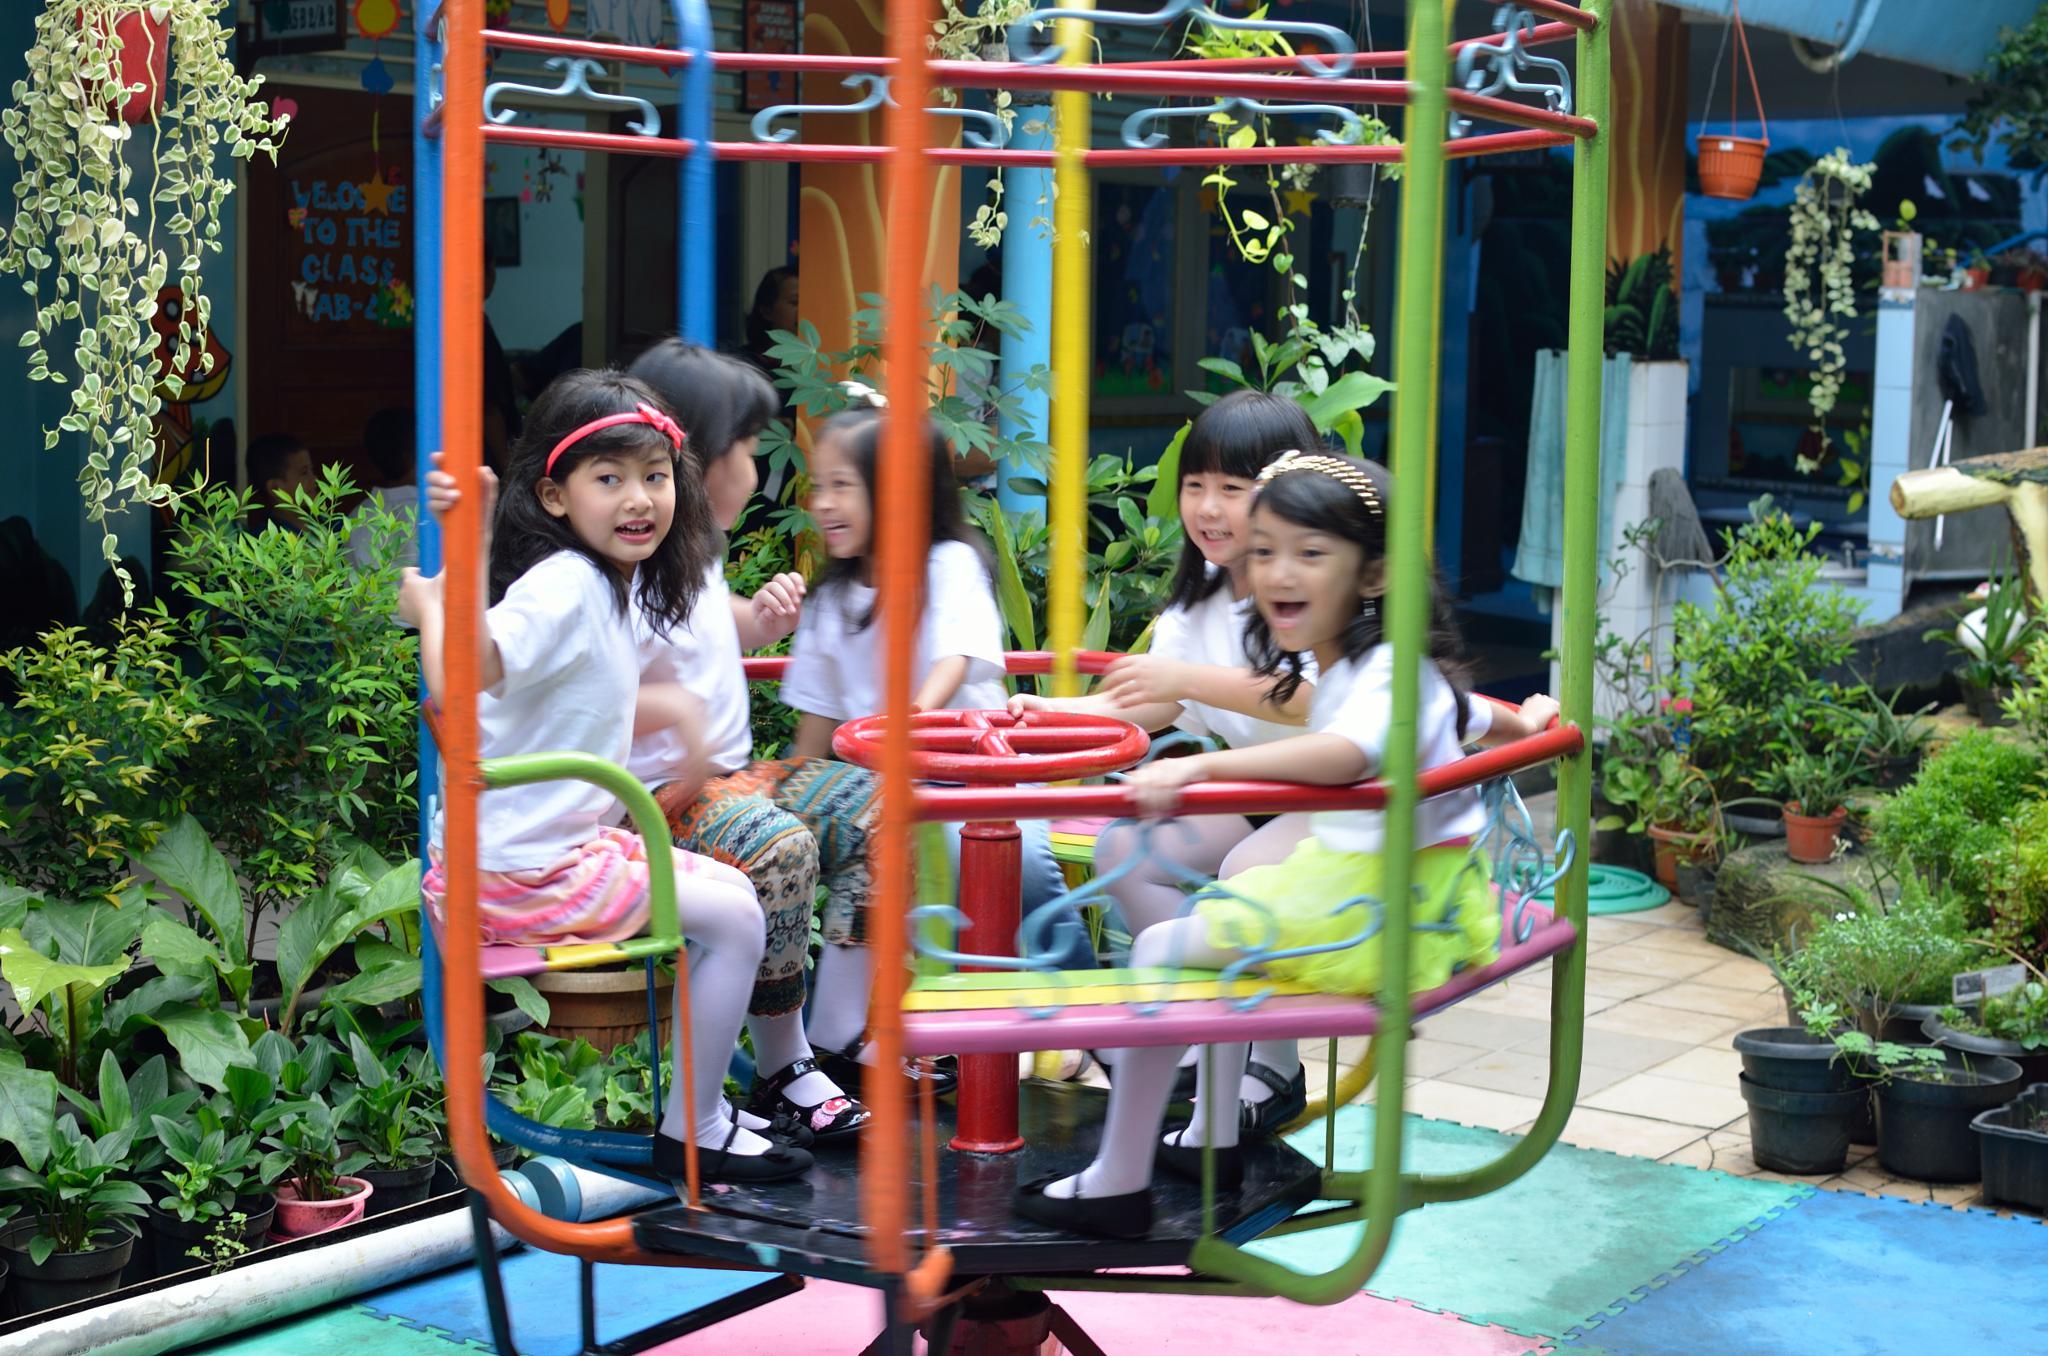 Children Playing by Yulius